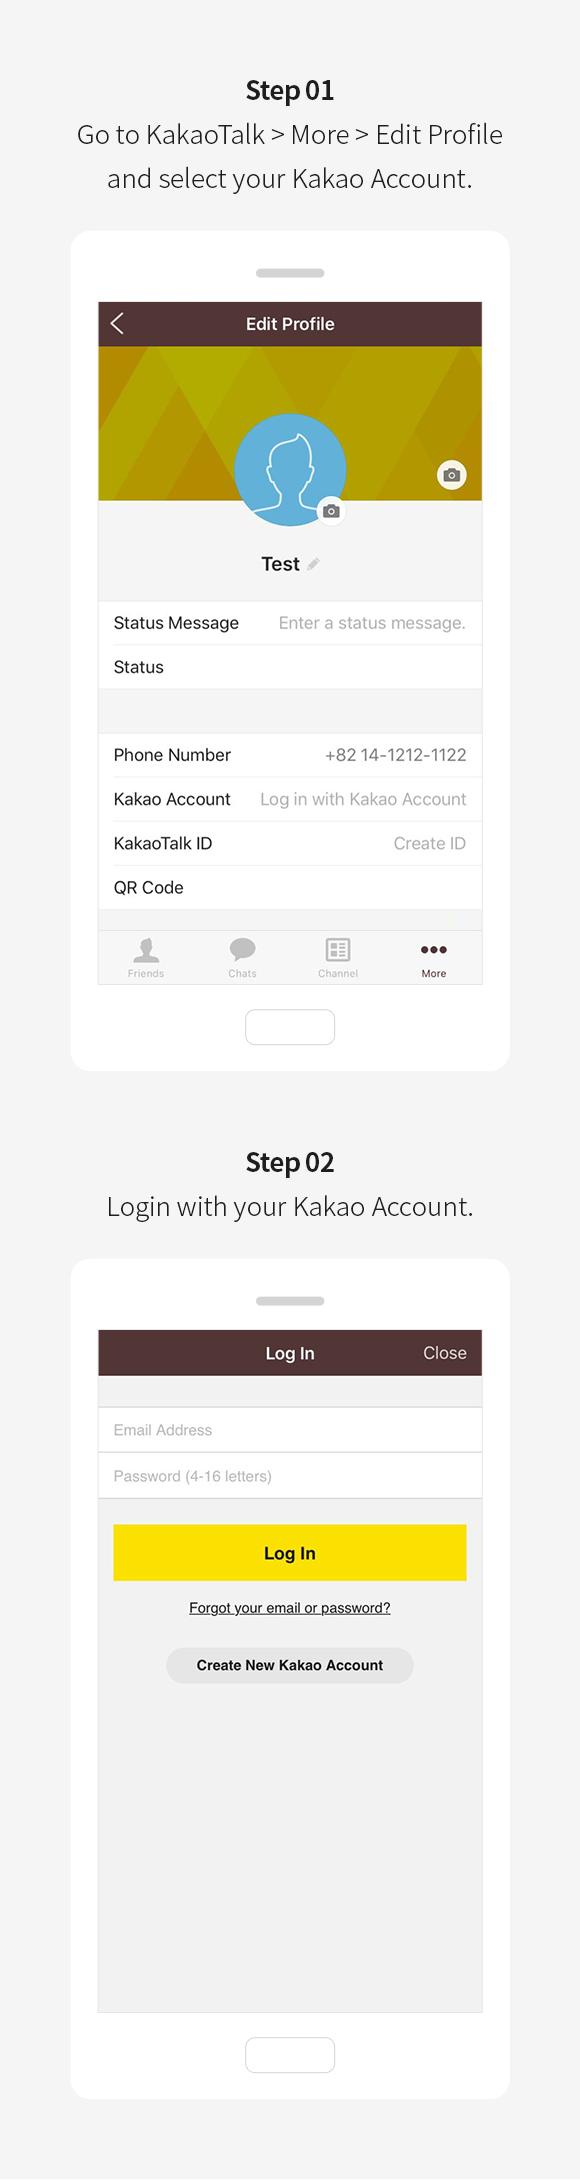 kakaotalk account change email